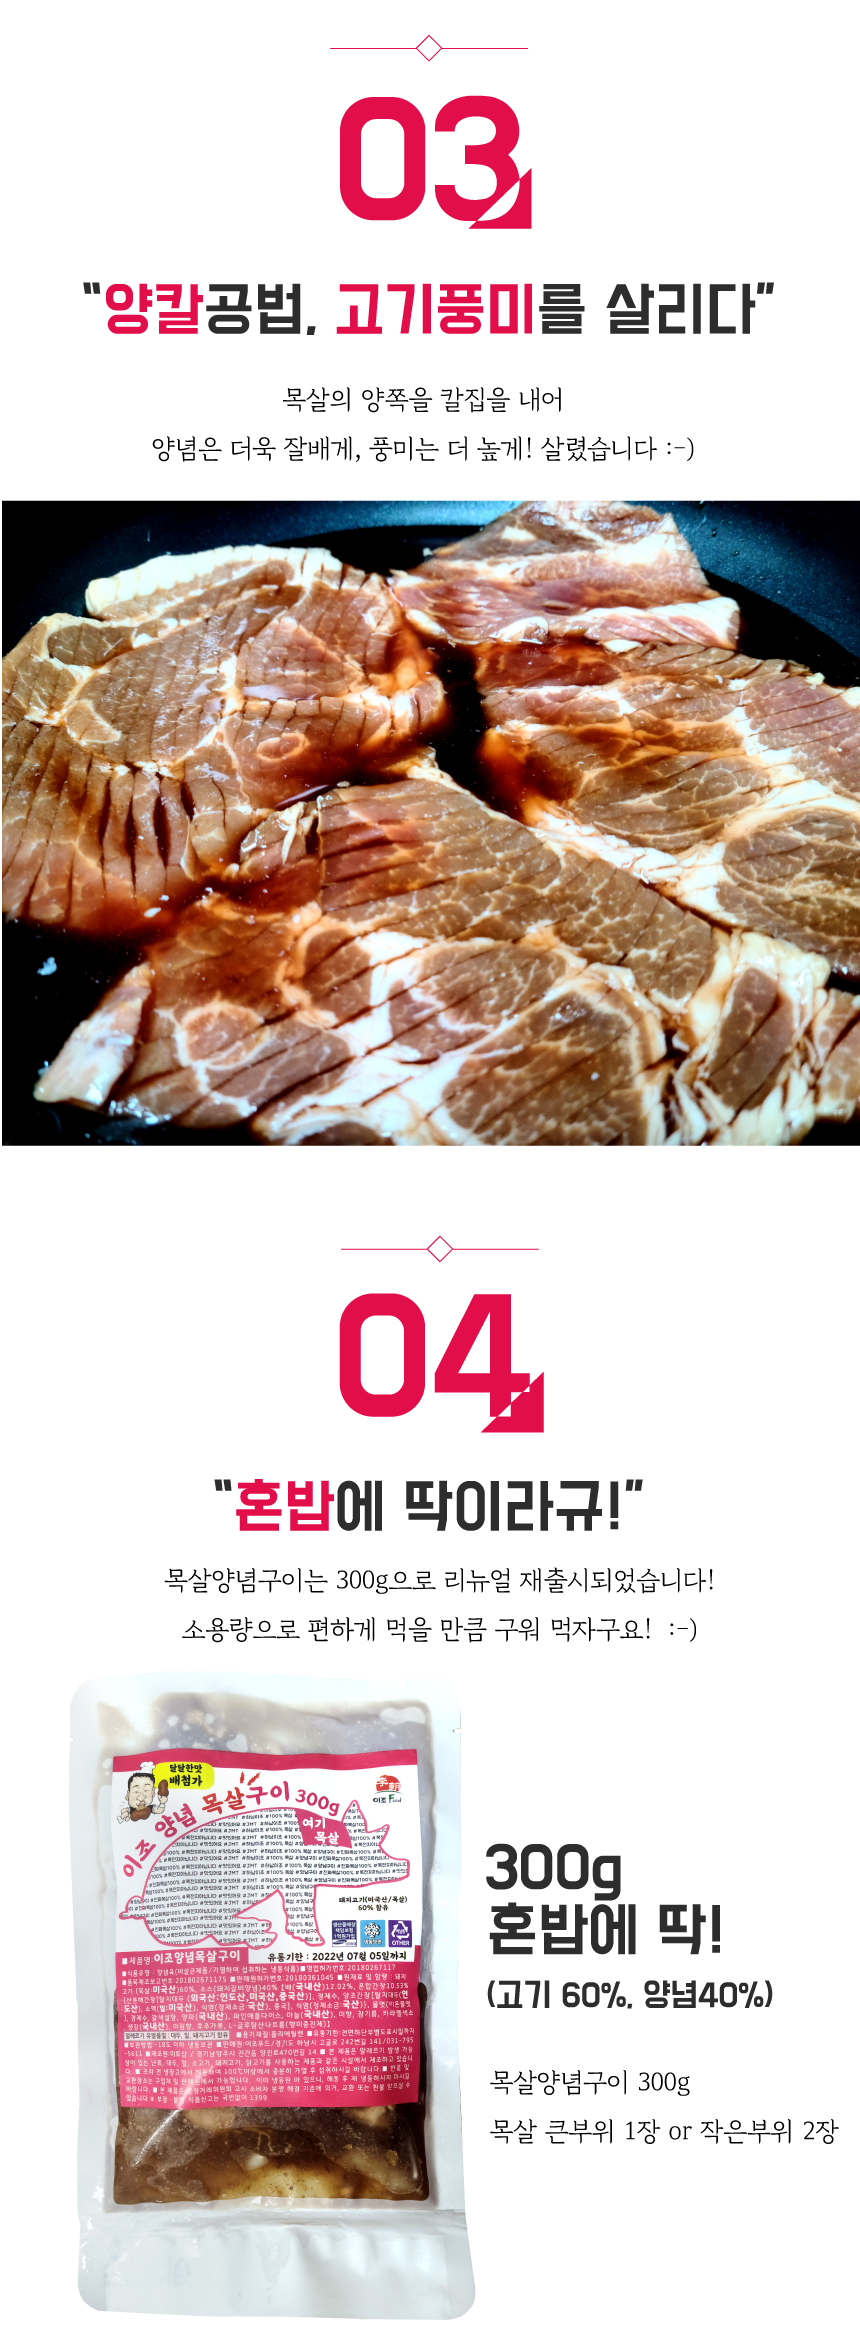 pork-300_600g-4.jpg